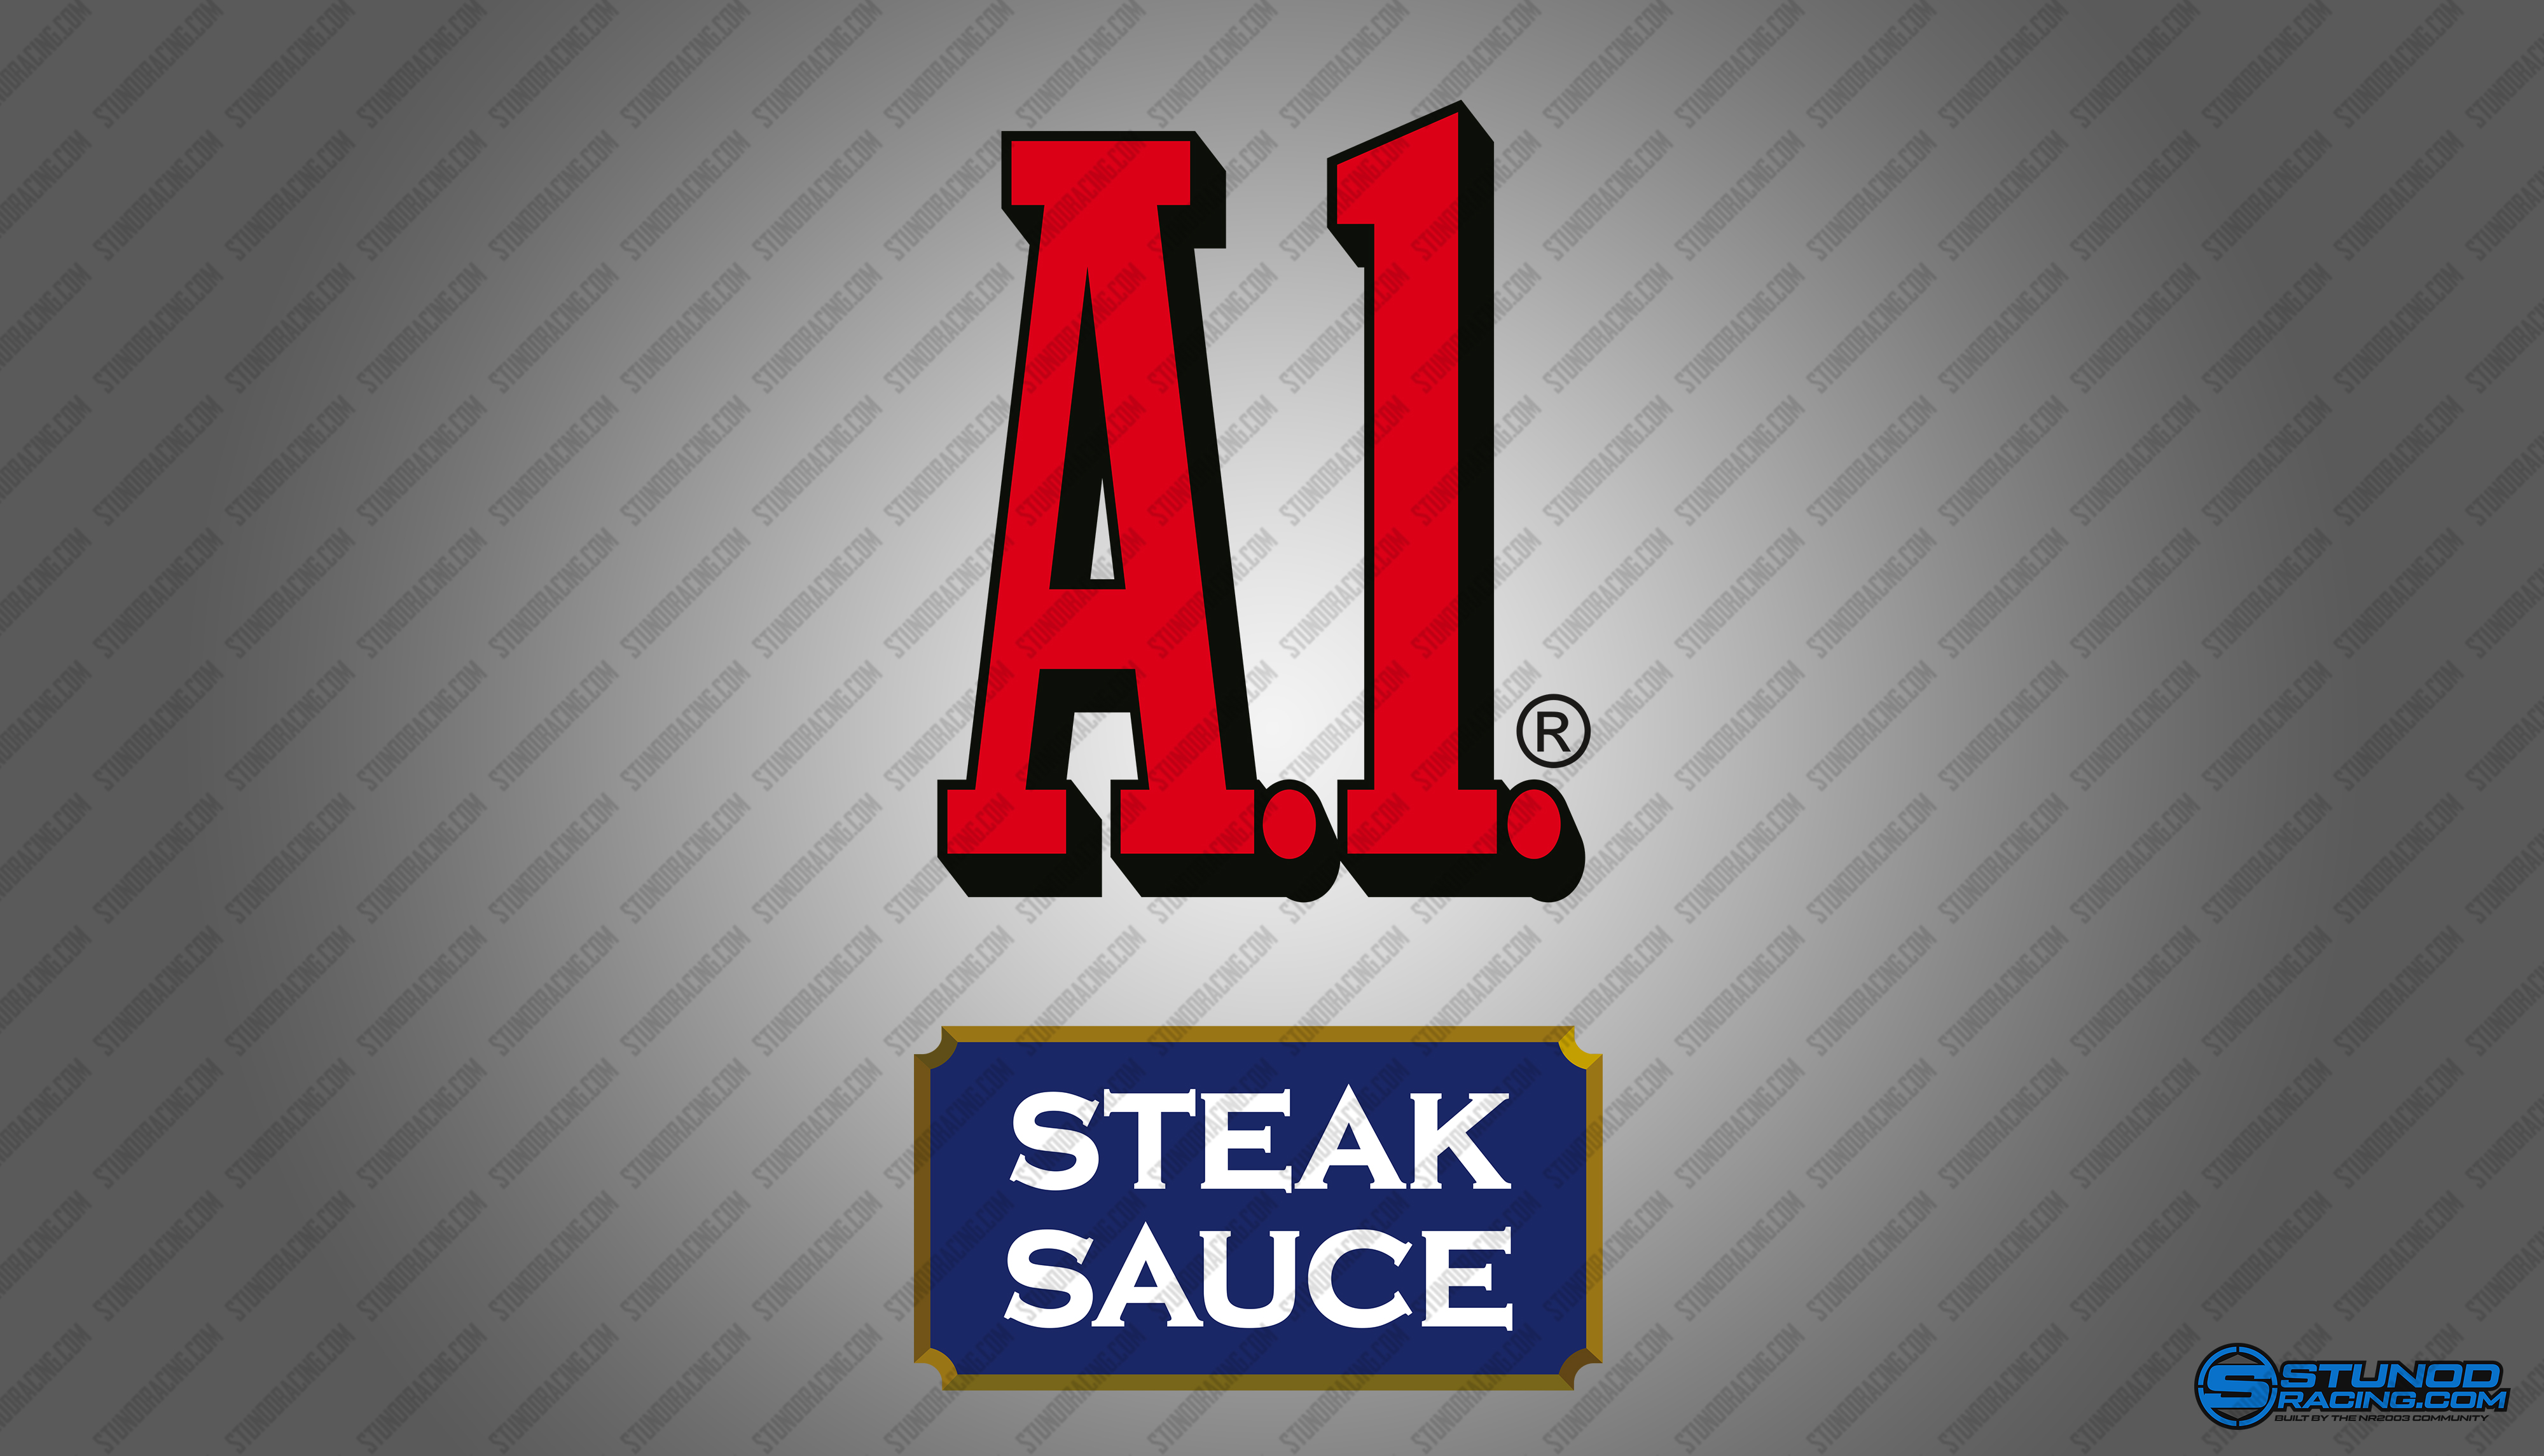 StunodRacing_A1_Steak-Sauce_Logo.jpg